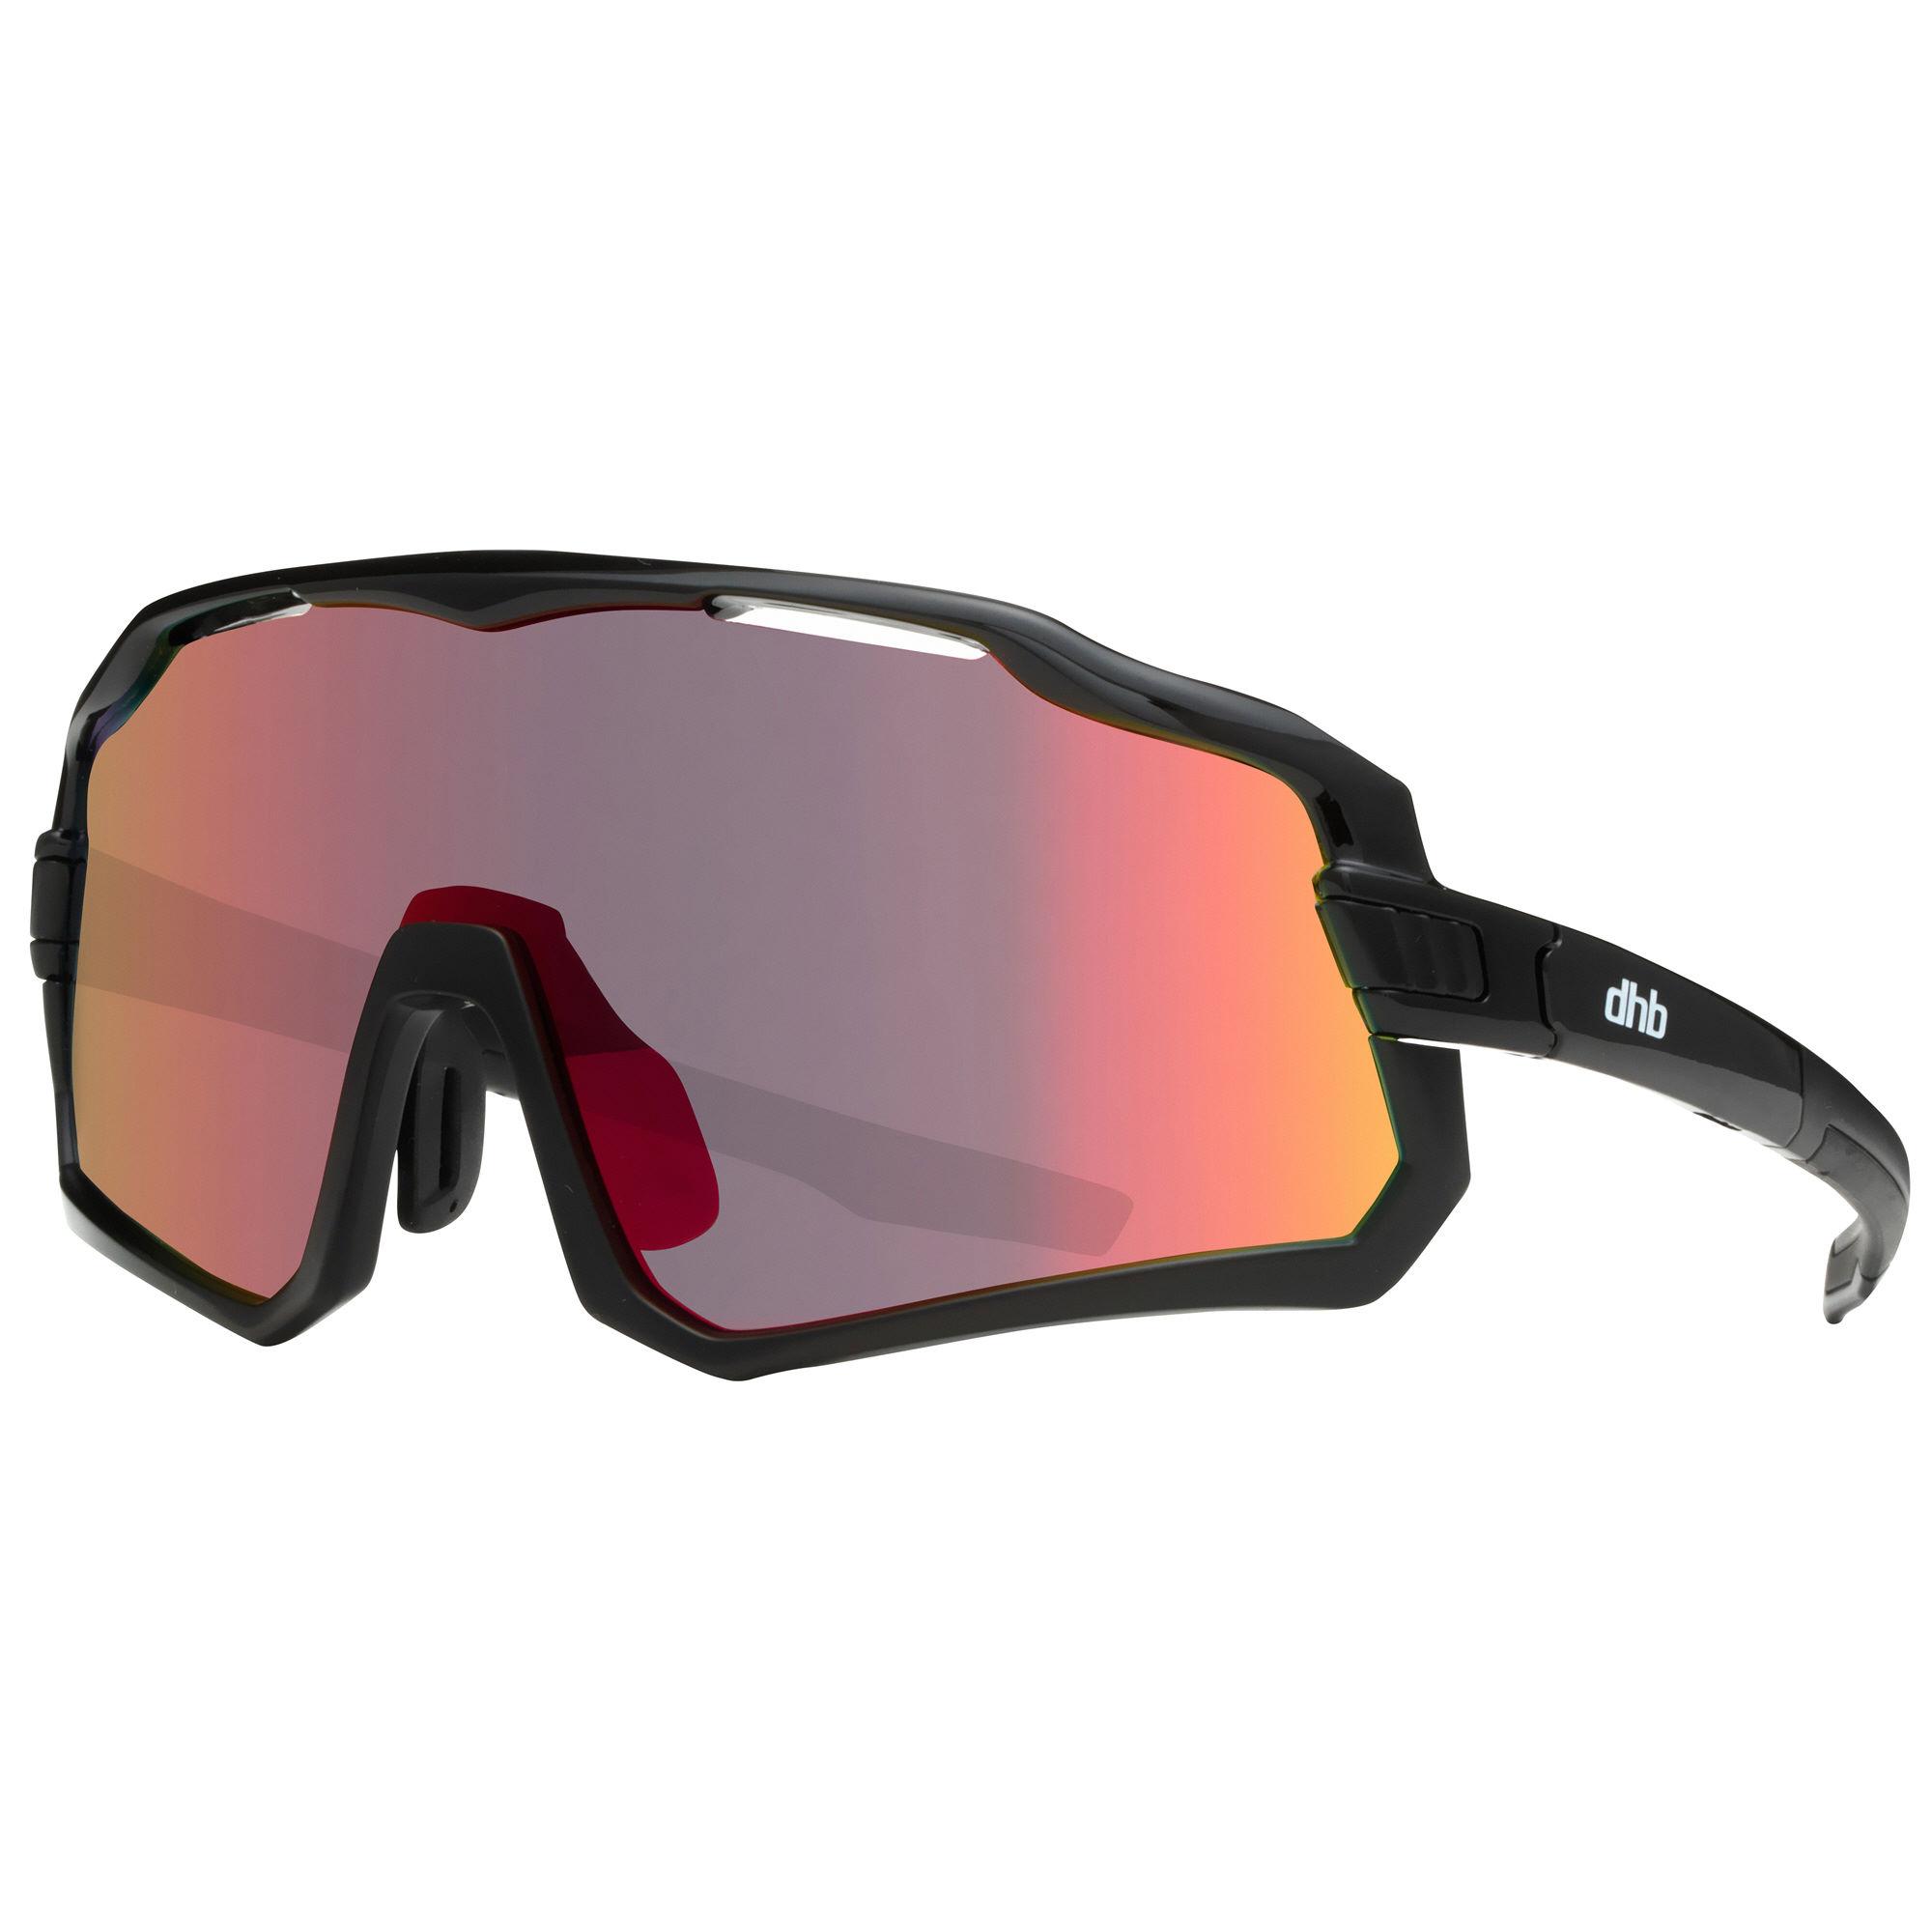 Dhb Vector Revo · Producto dhb · Gafas de Ciclismo · Accesorios · Kukimbia Shop - Tienda Online Trail & Running